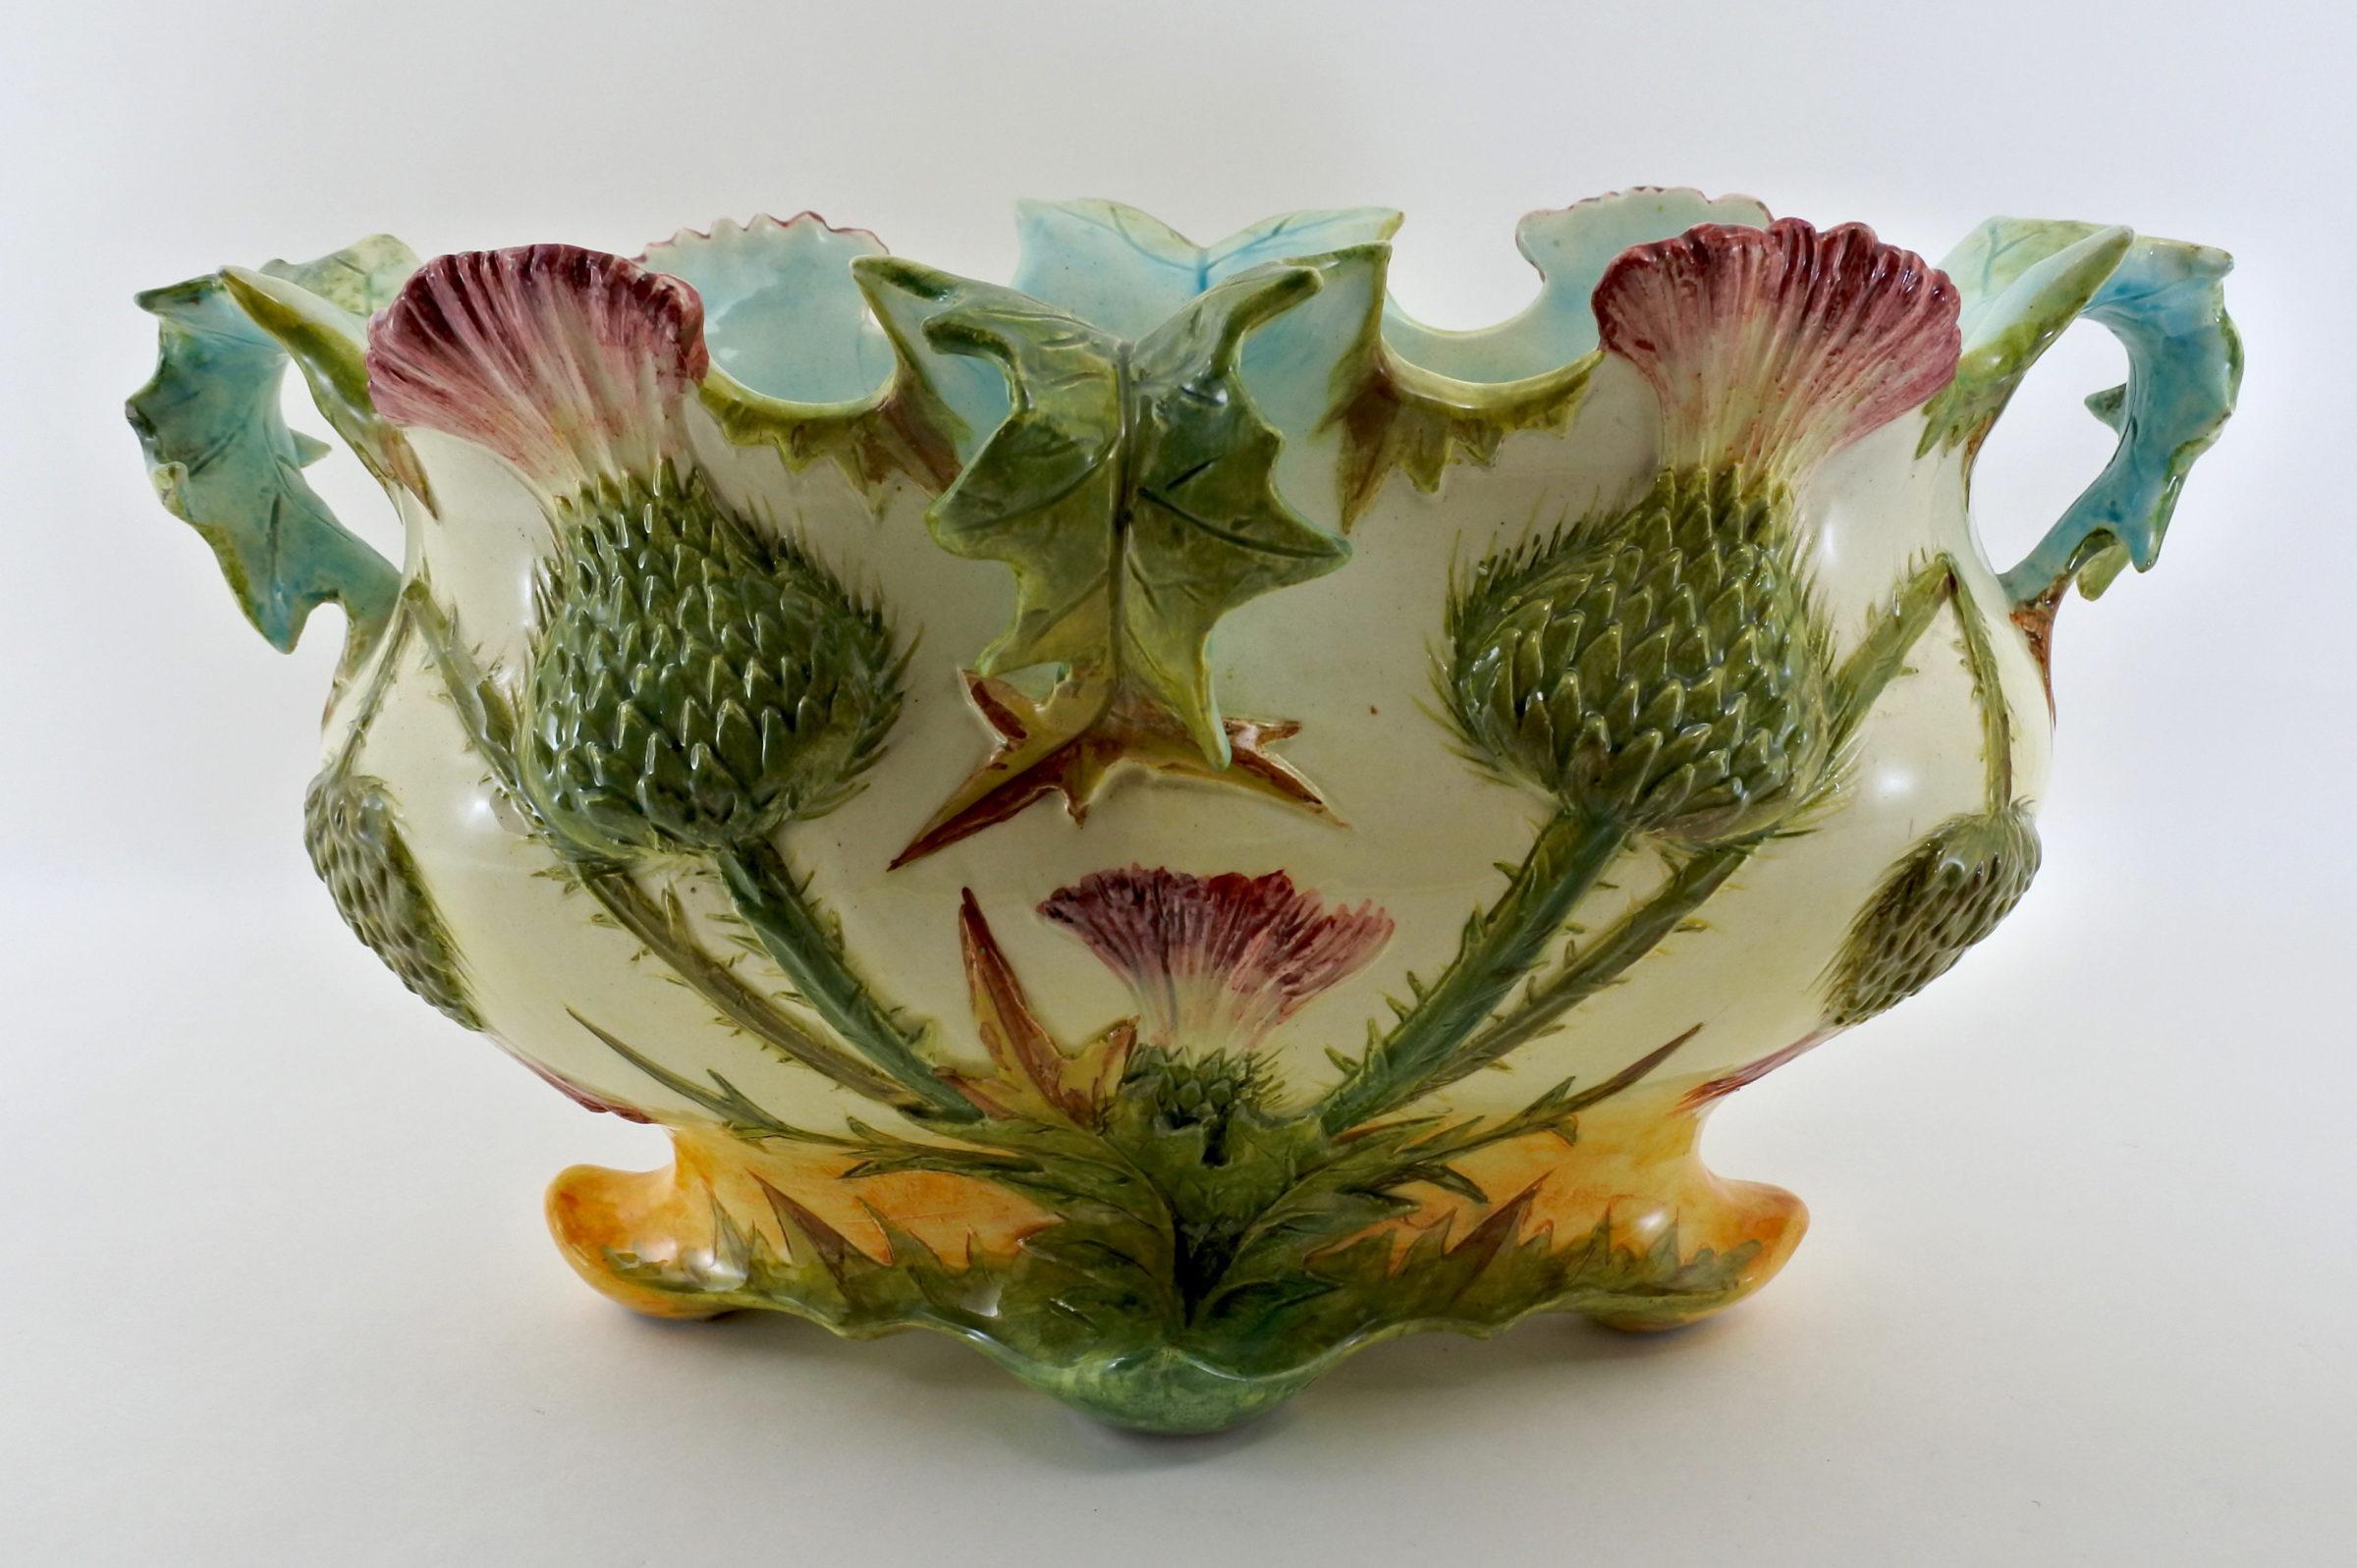 Jardinière Massier in ceramica barbotine con cardi - Chardons